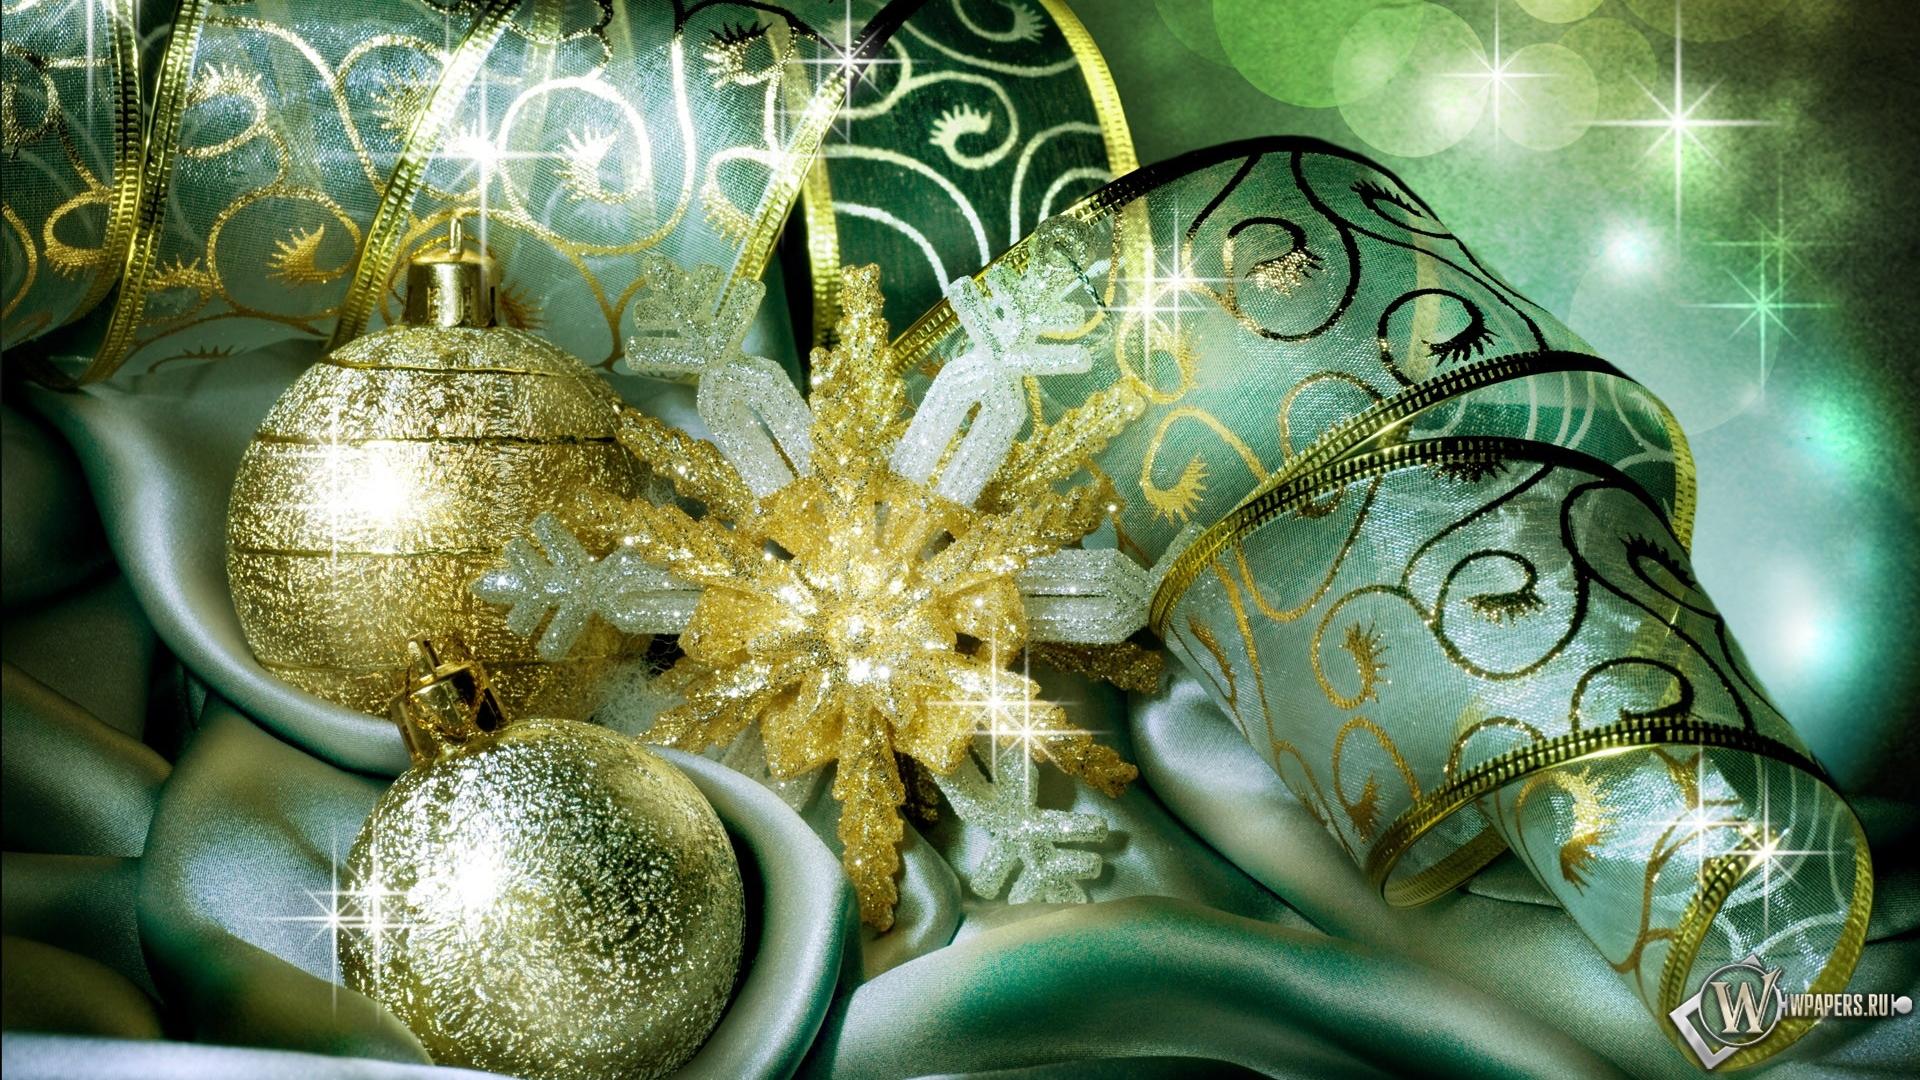 праздничные шарики на рабочий стол ...: wpapers.ru/wallpapers/Holidays/New-Year/9636/1920-1080...